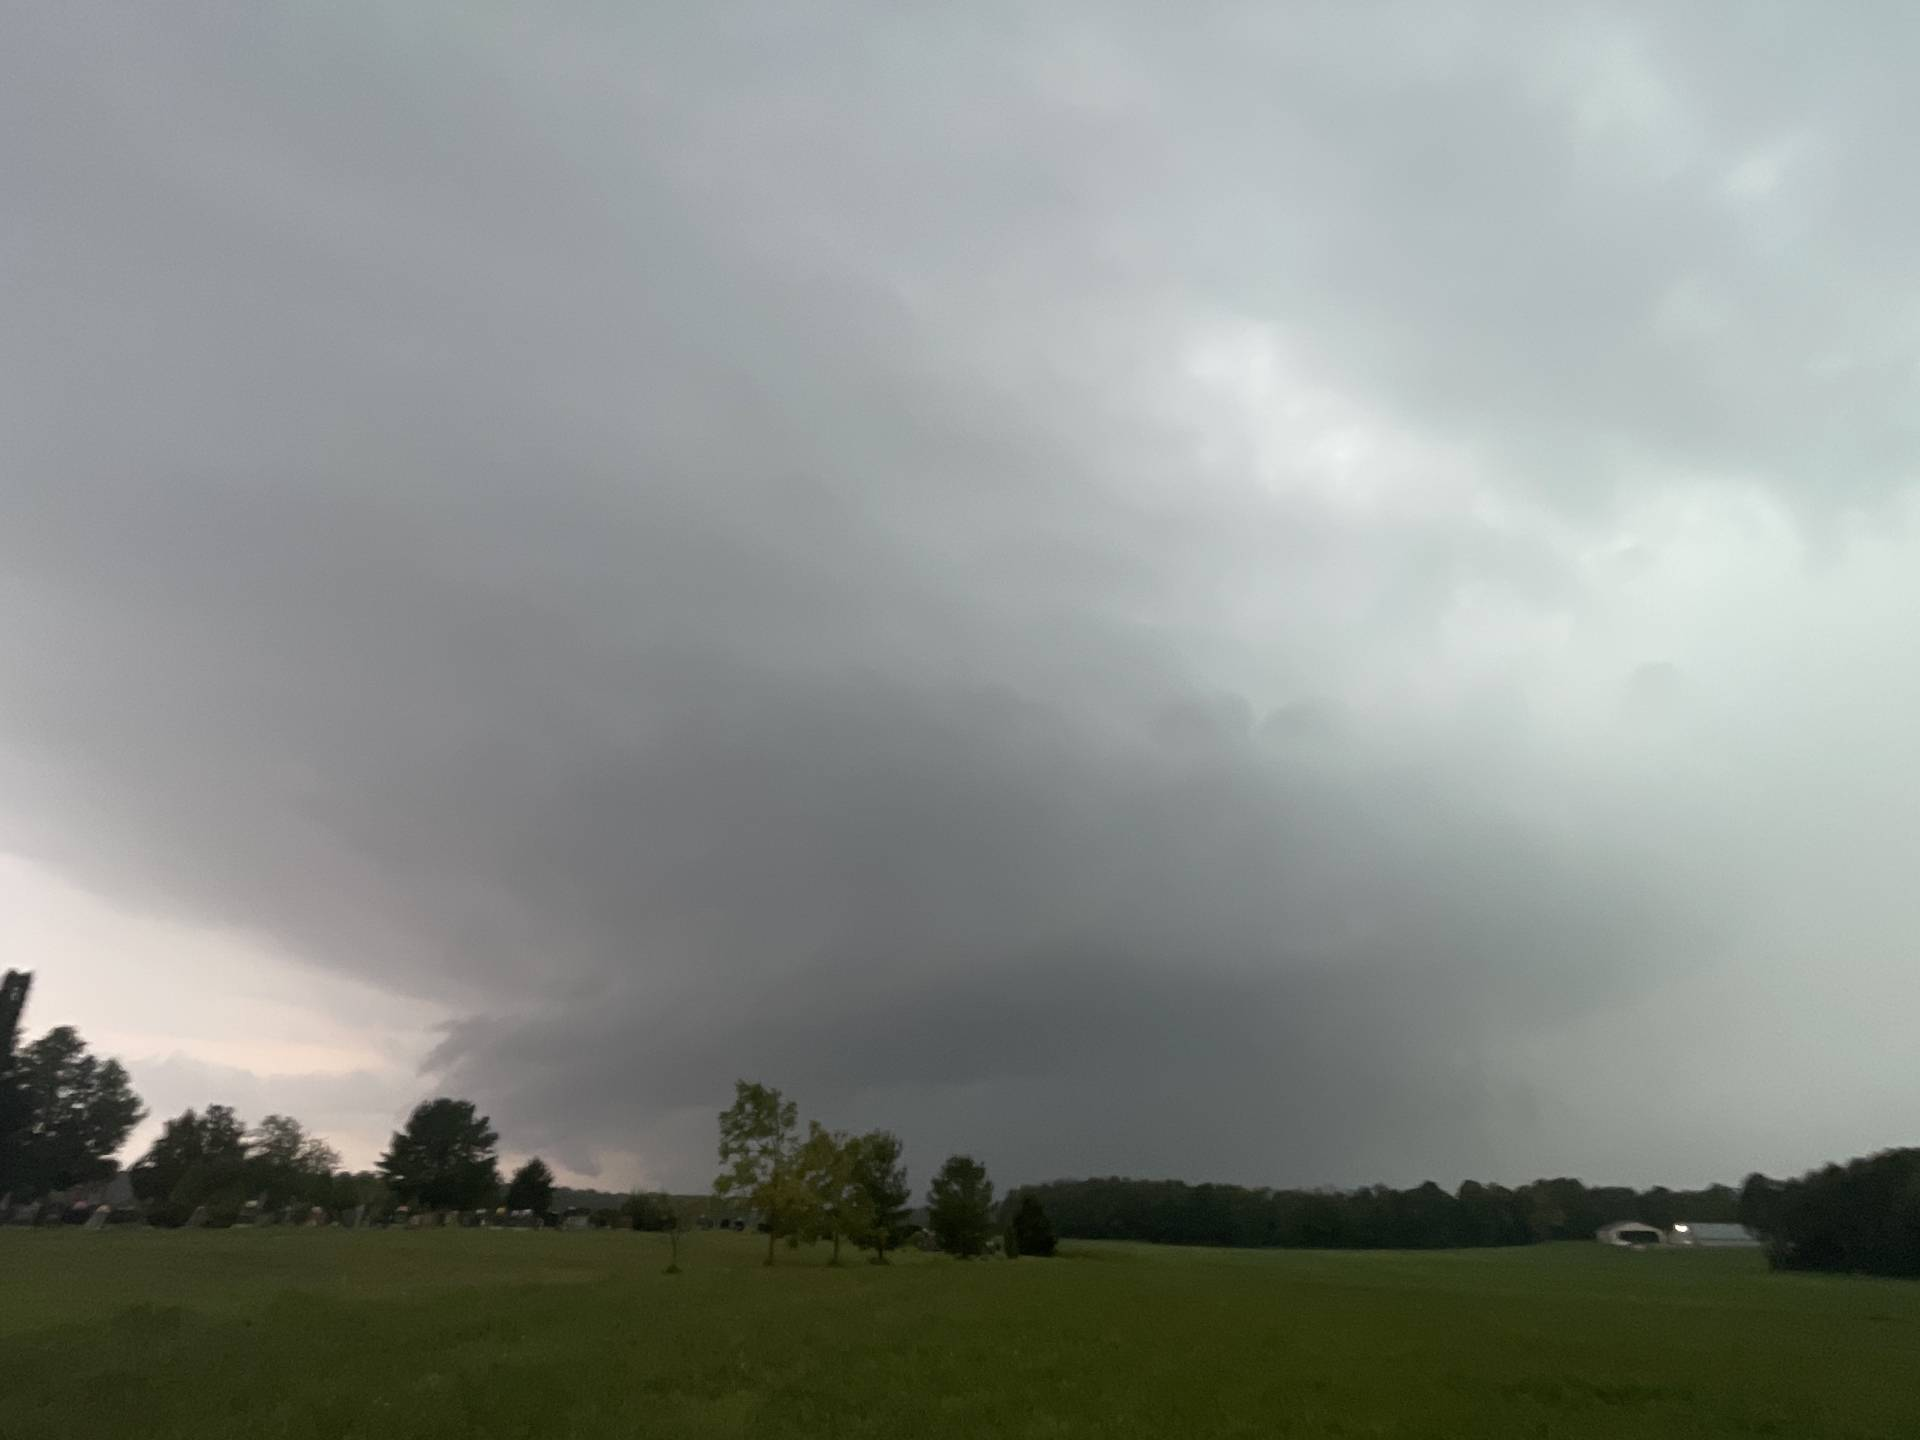 Tornado warned supercell Cargill, ON 06:31 PM #ONstorm